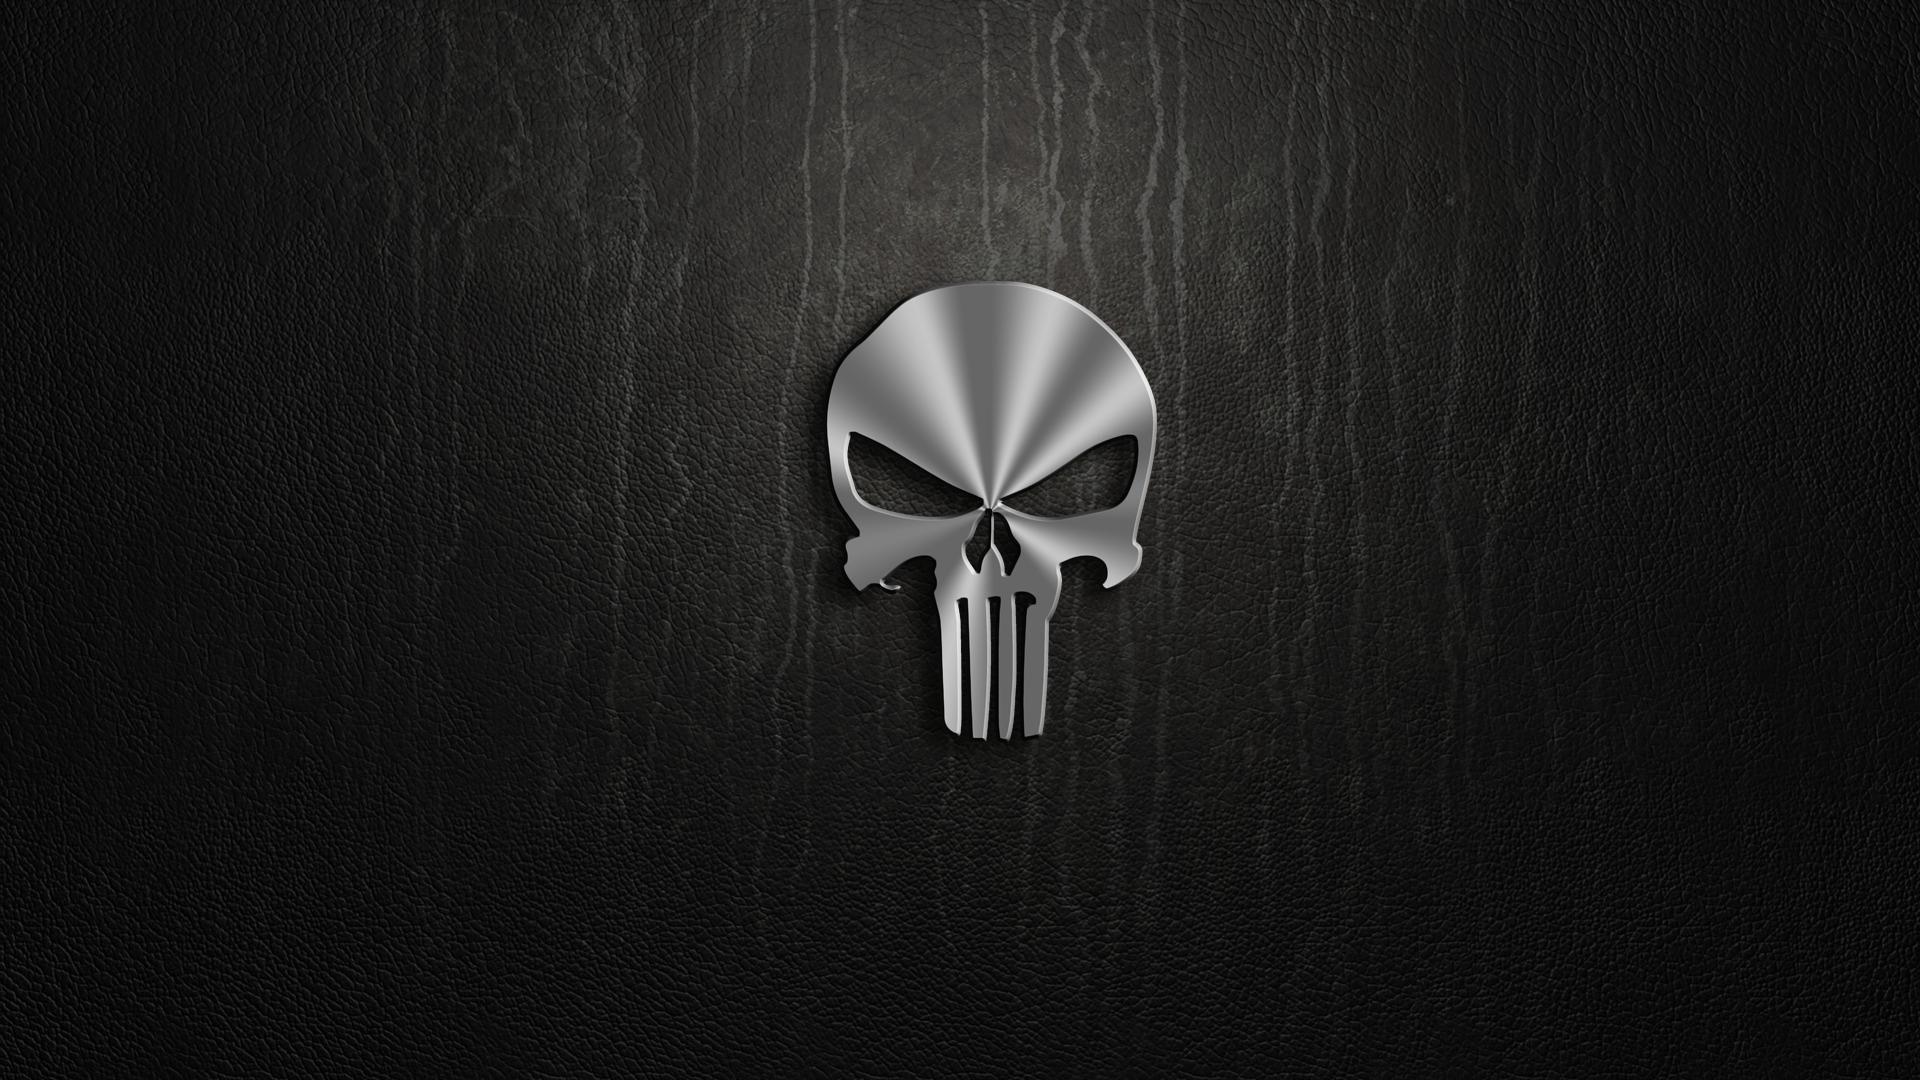 Wallpaper Google Search Black Skulls Wallpaper Skull Wallpaper Hd Wallpapers For Laptop